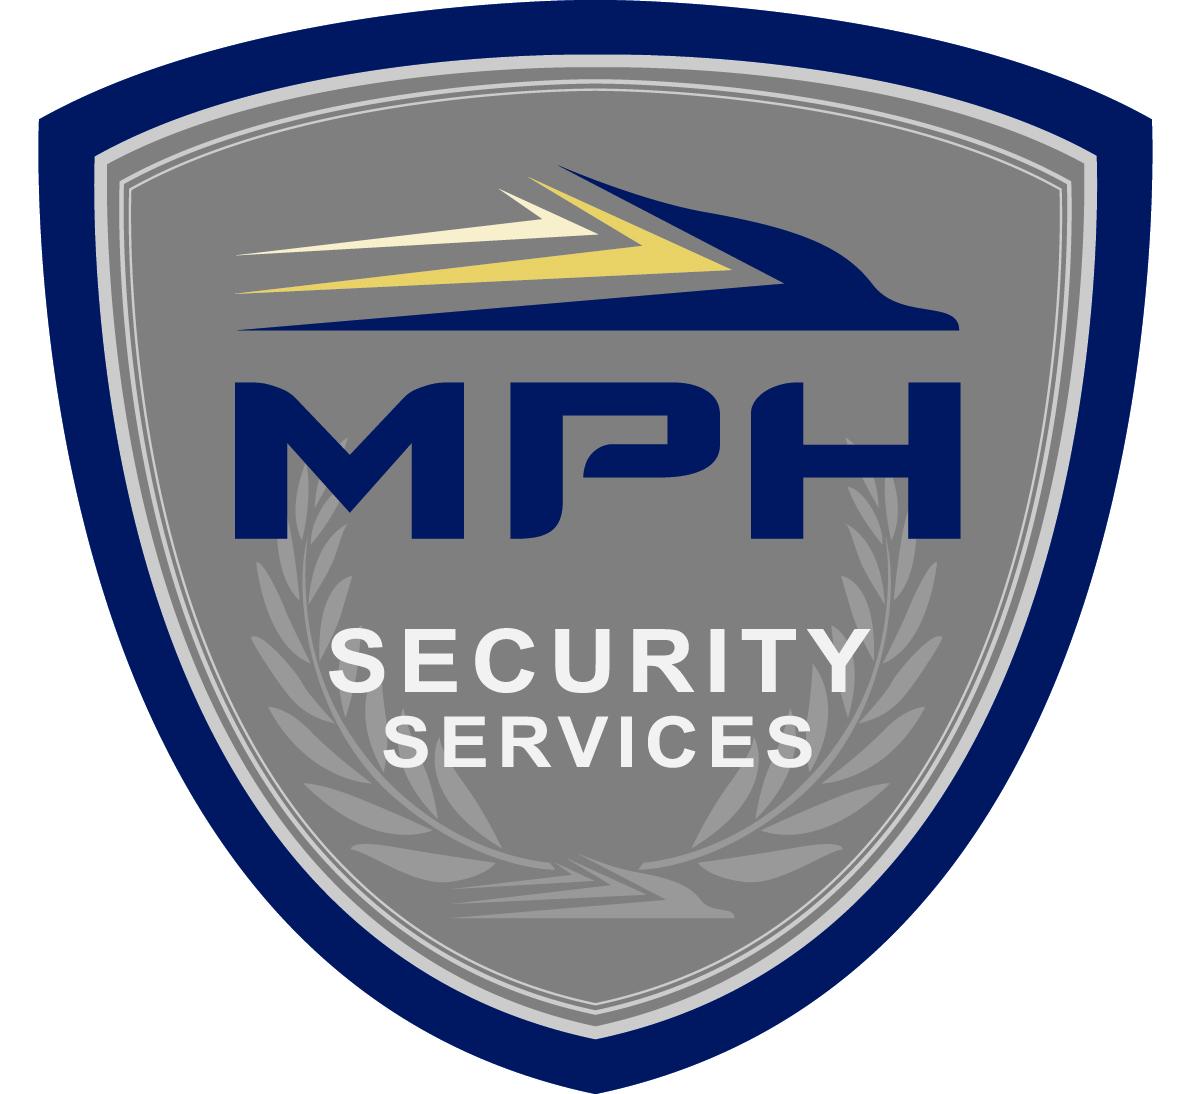 MPHI Security Services